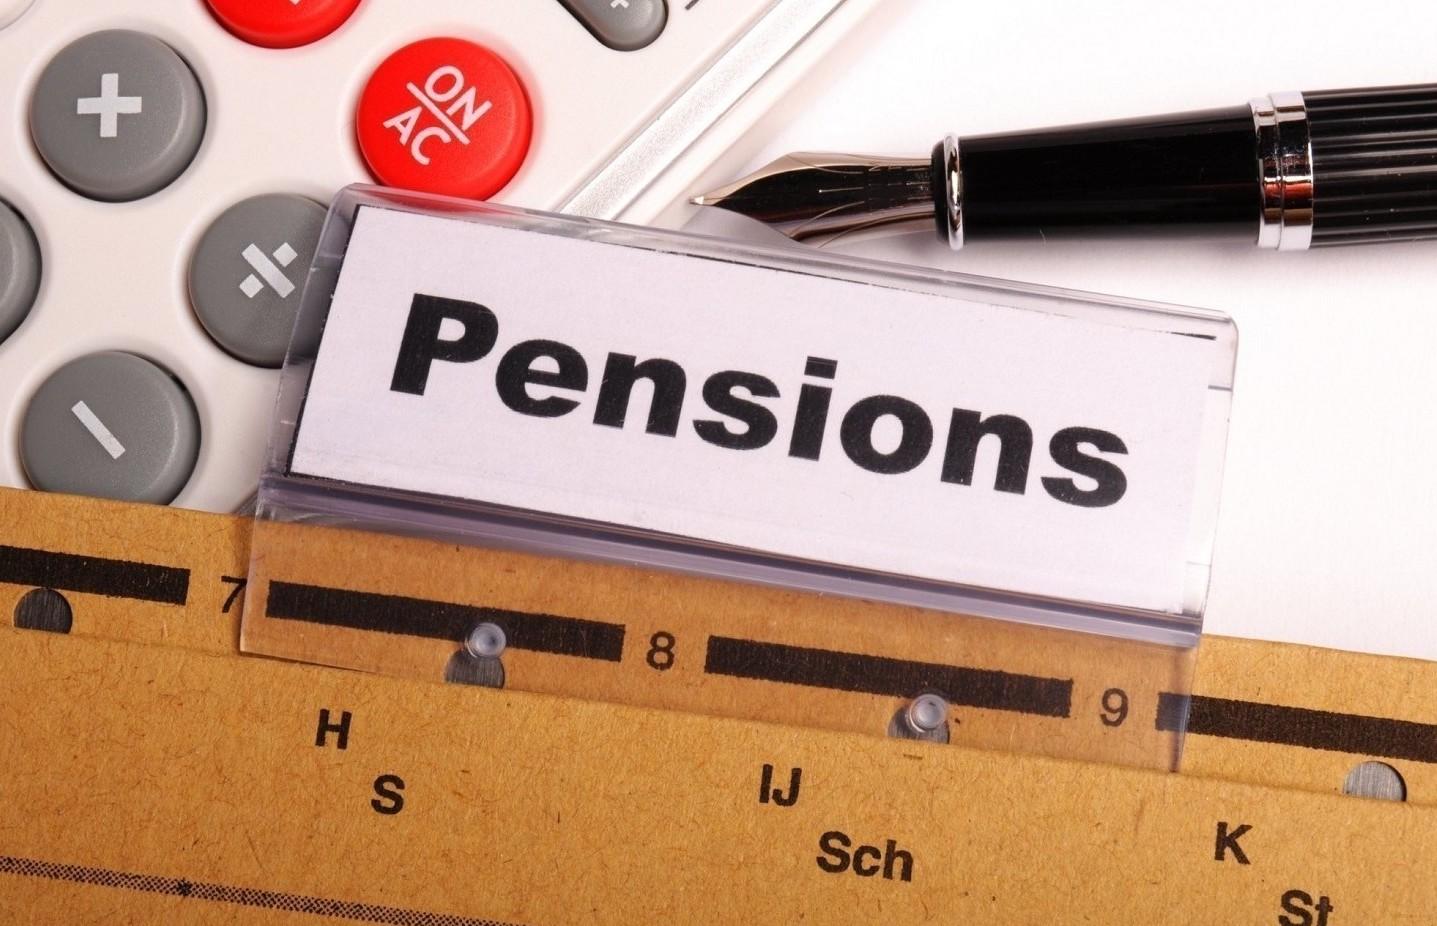 Pensioni novit�, due blocchi al DEF uno